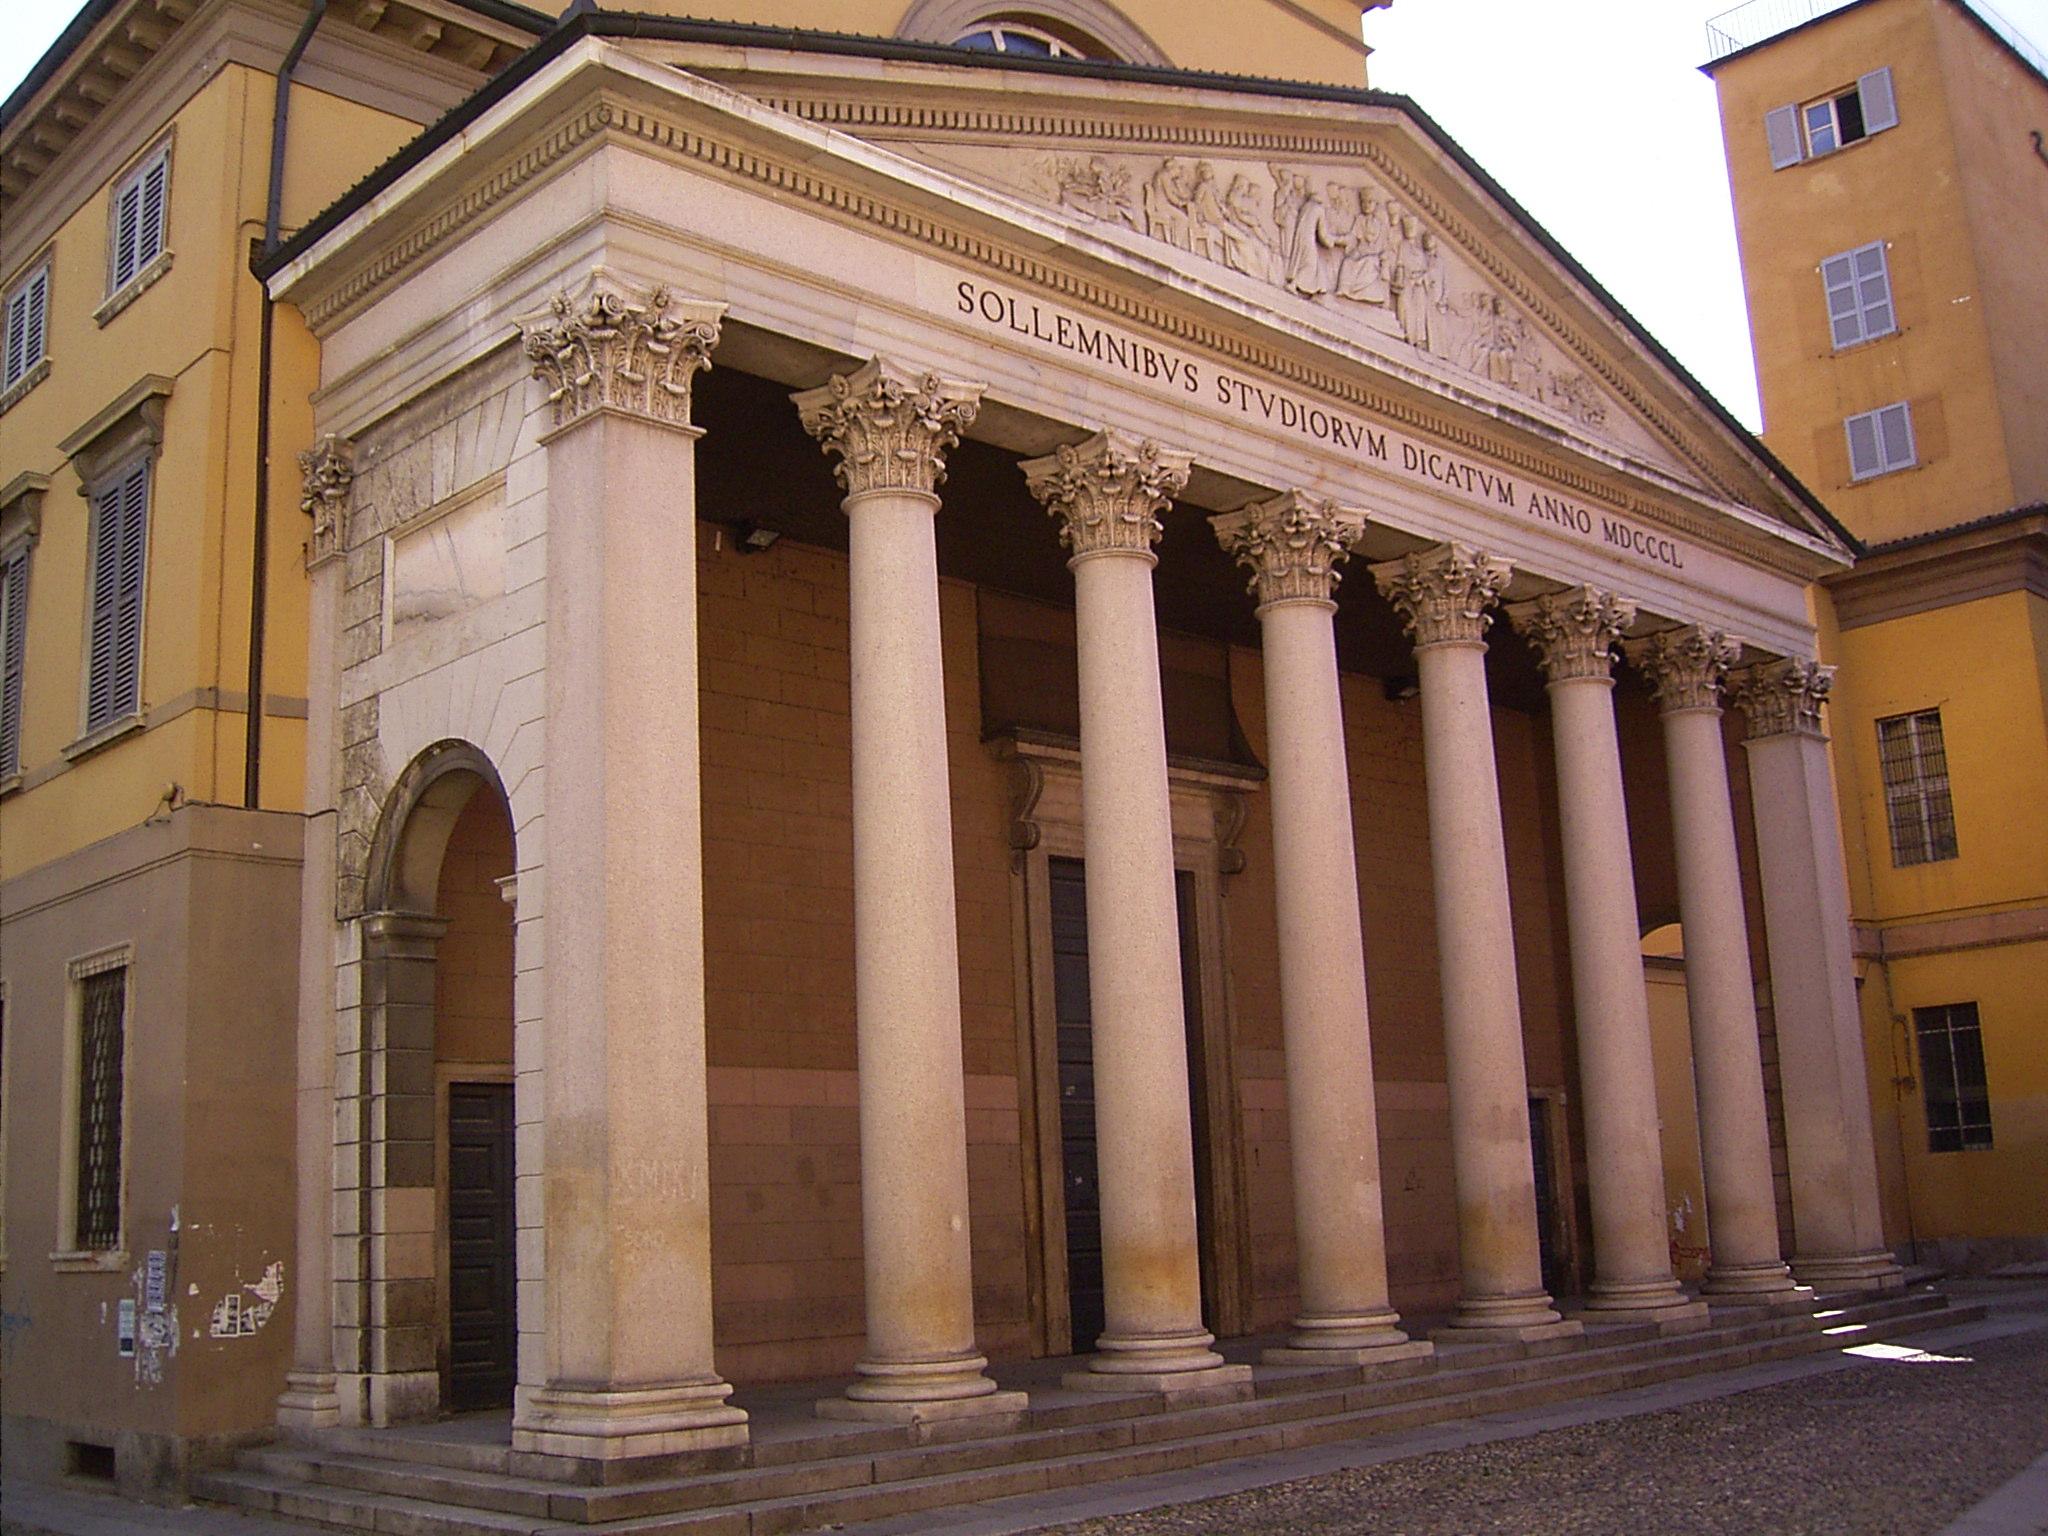 image of University of Pavia